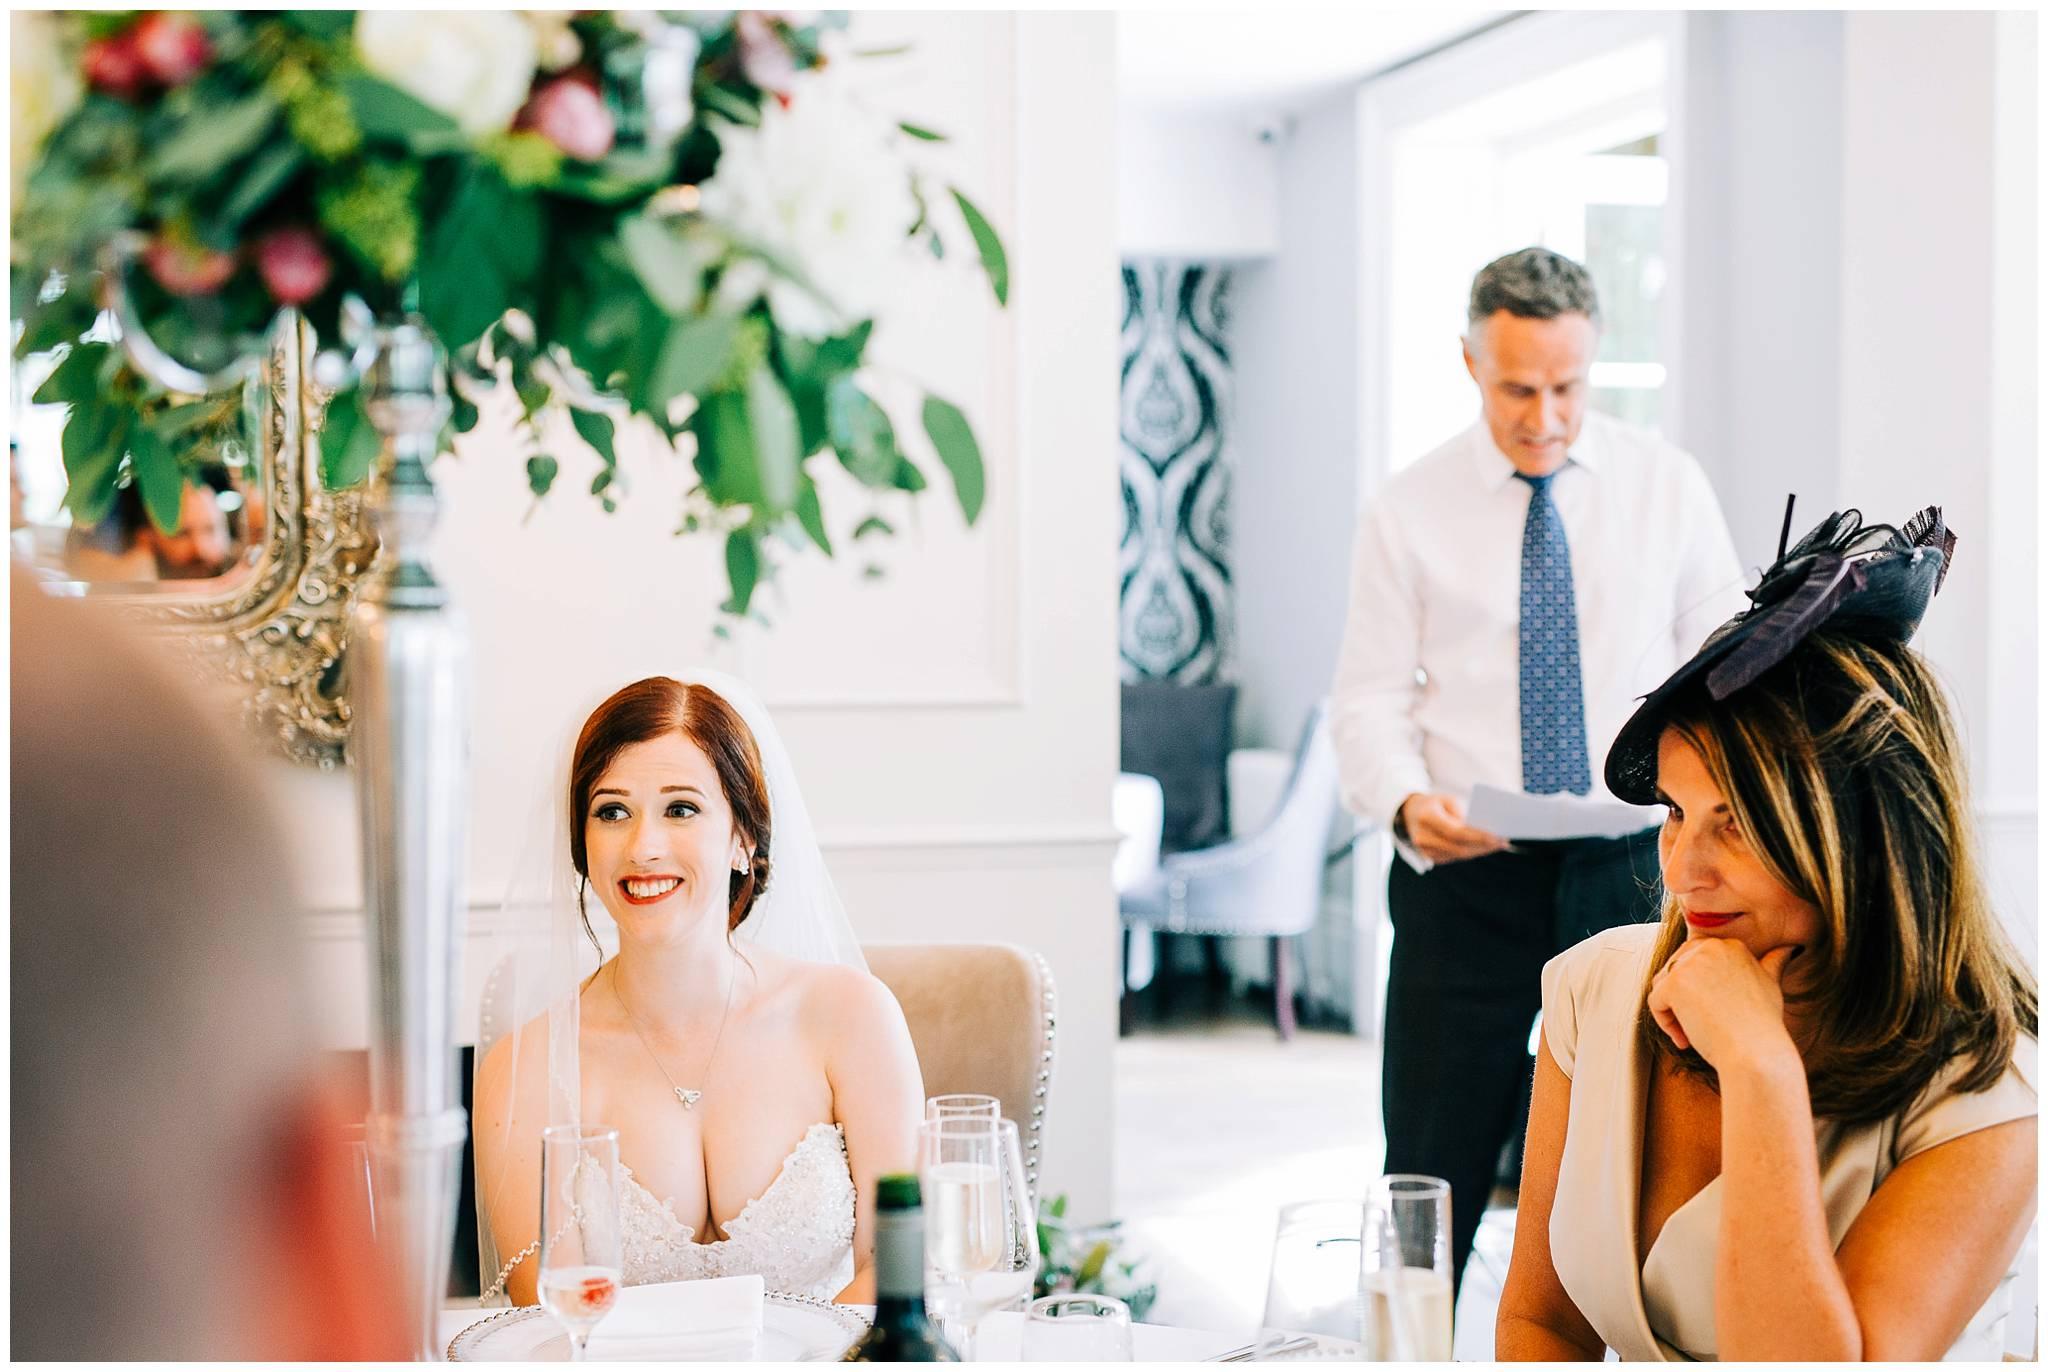 Summer Garden Wedding - The Old Vicarage Boutique Hotel65.jpg